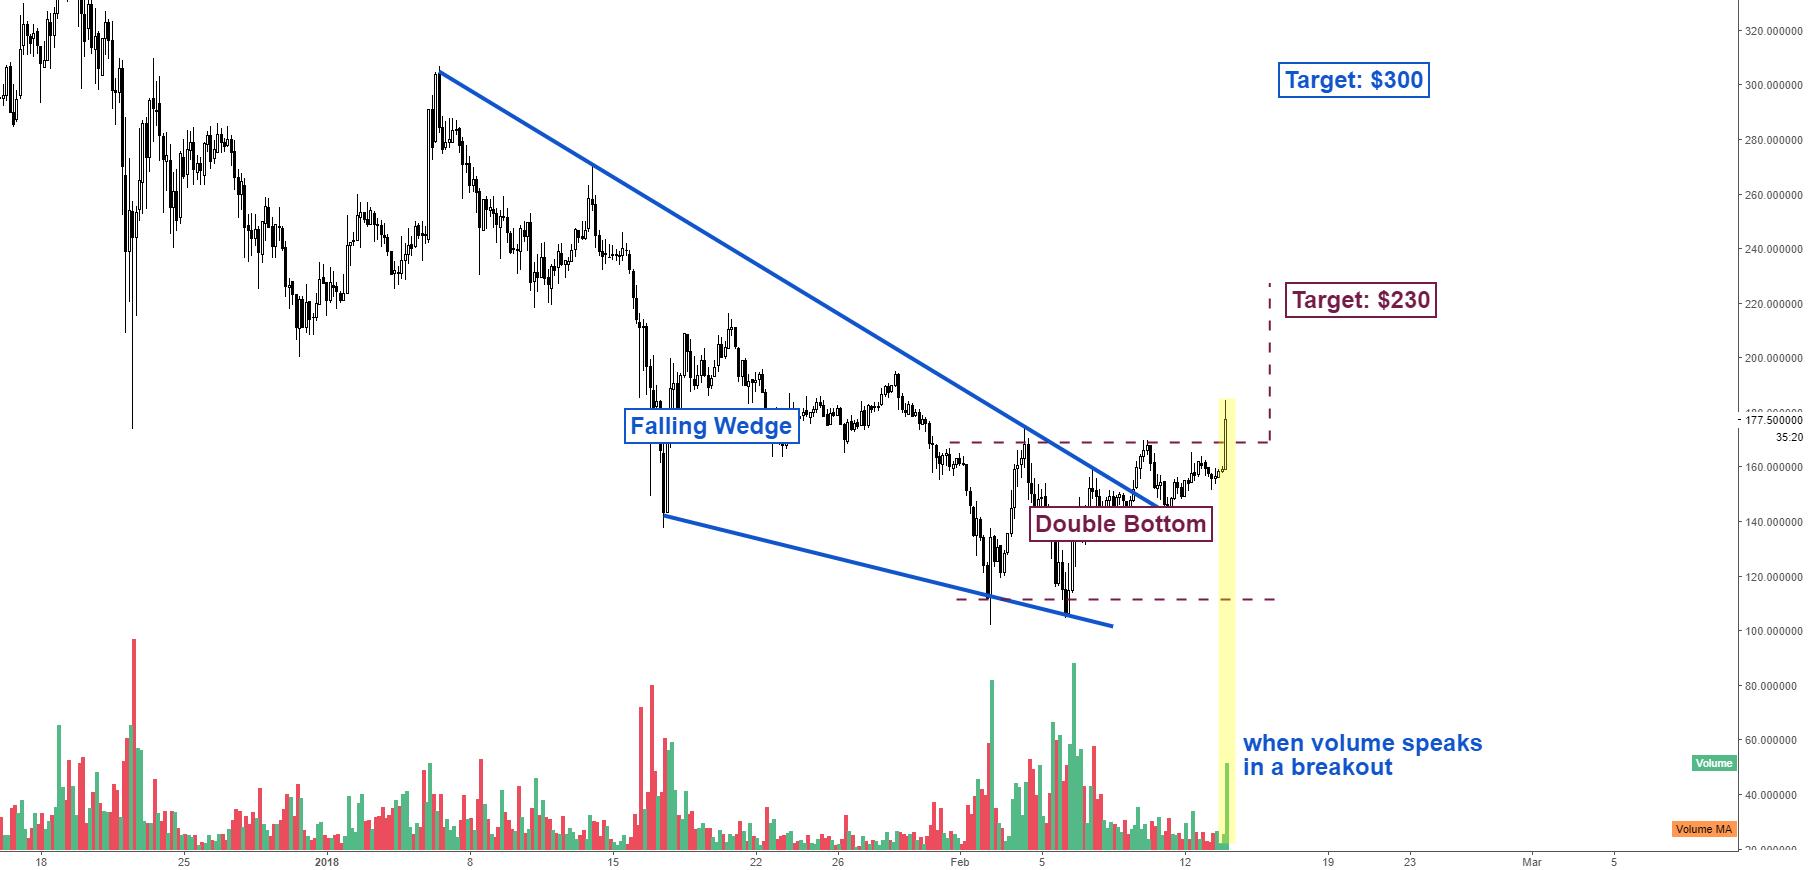 Litecoin Price Analysis - we got a breakout, finally!